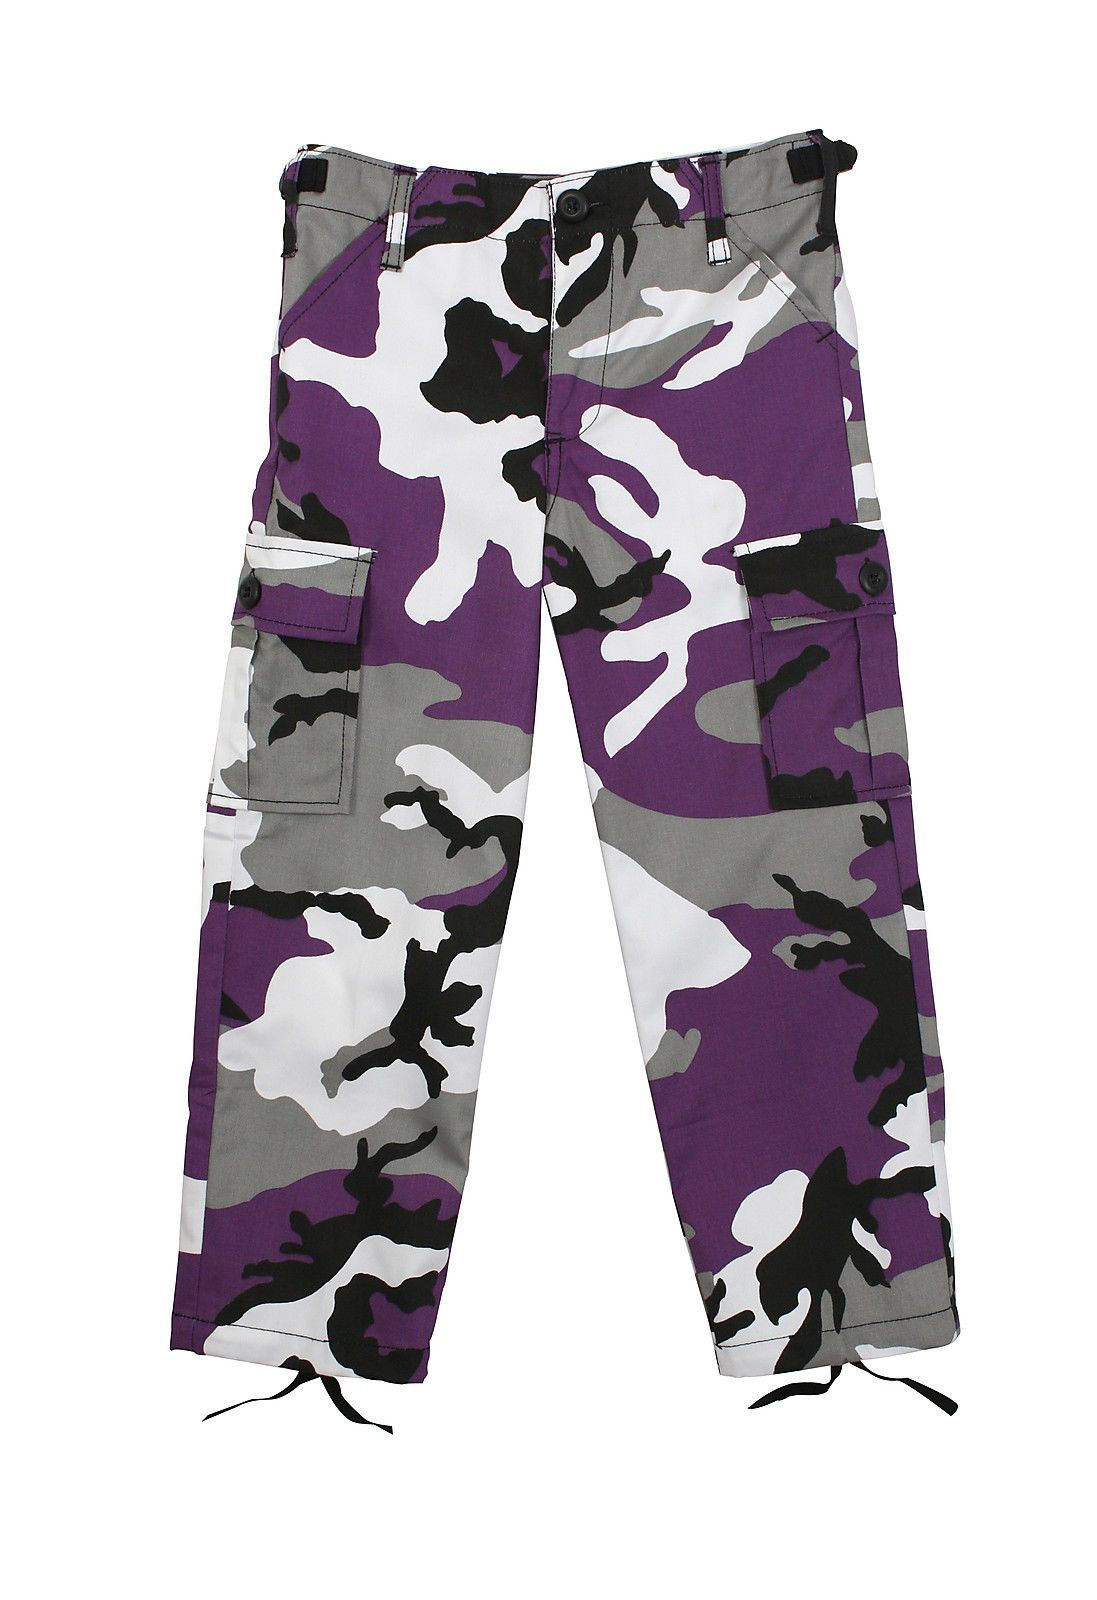 246efefb3b5 Kids Ultra Violet Military BDU Pants - Childs Purple Camo Pants ...